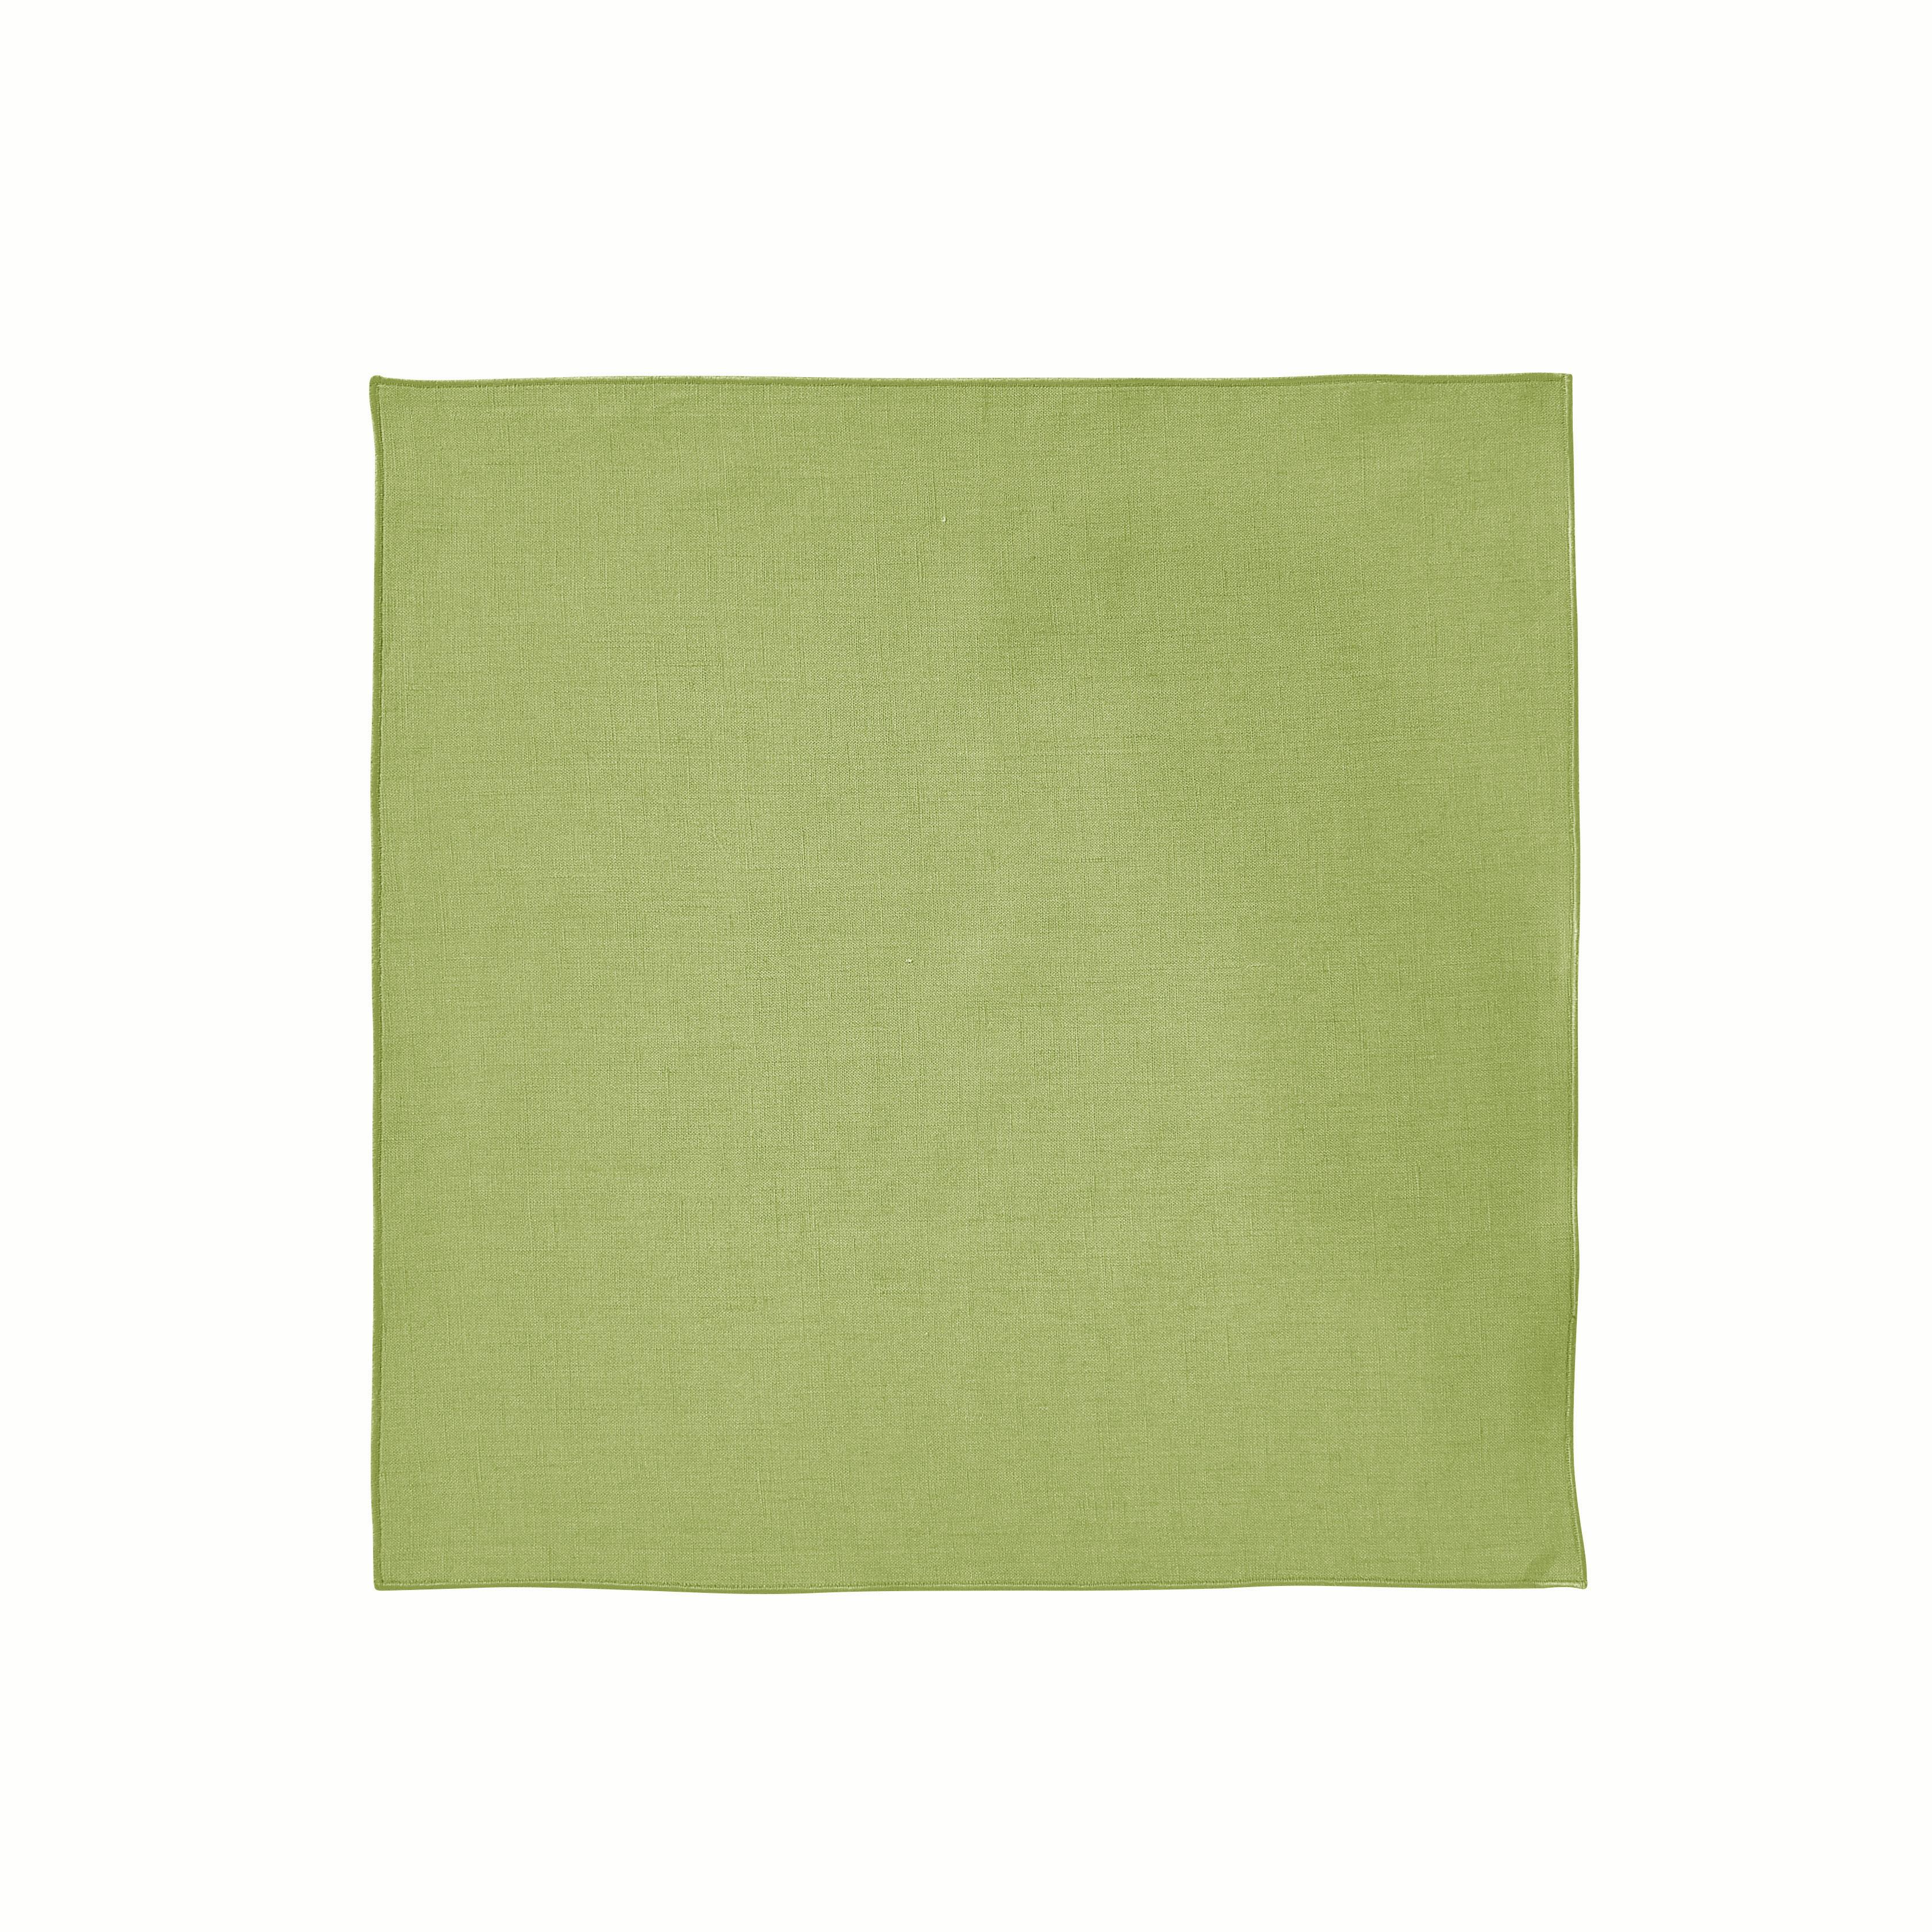 Serviette de table en lin vert basilic 35x35